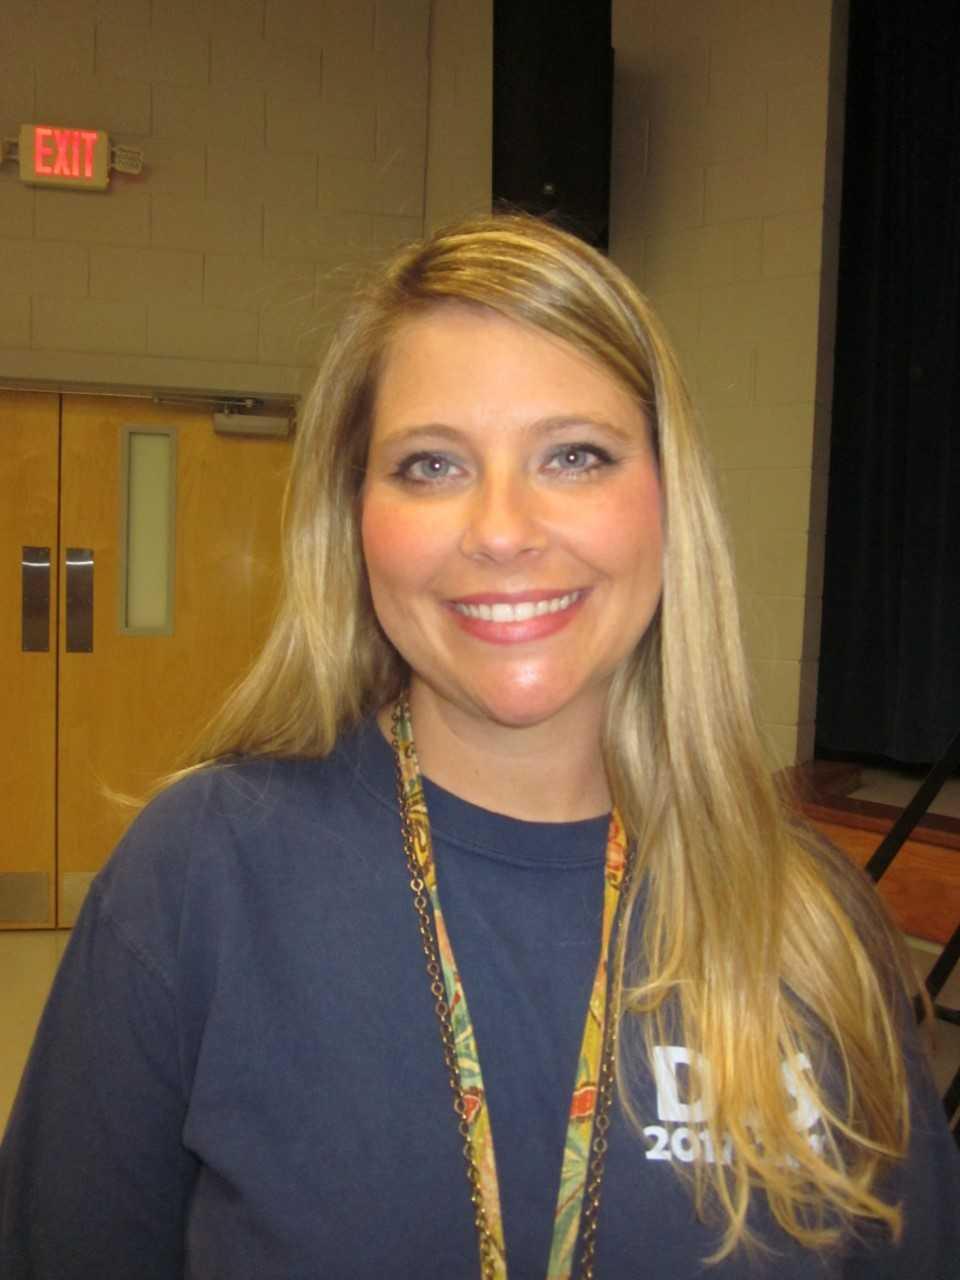 Close up of Mrs. Clark